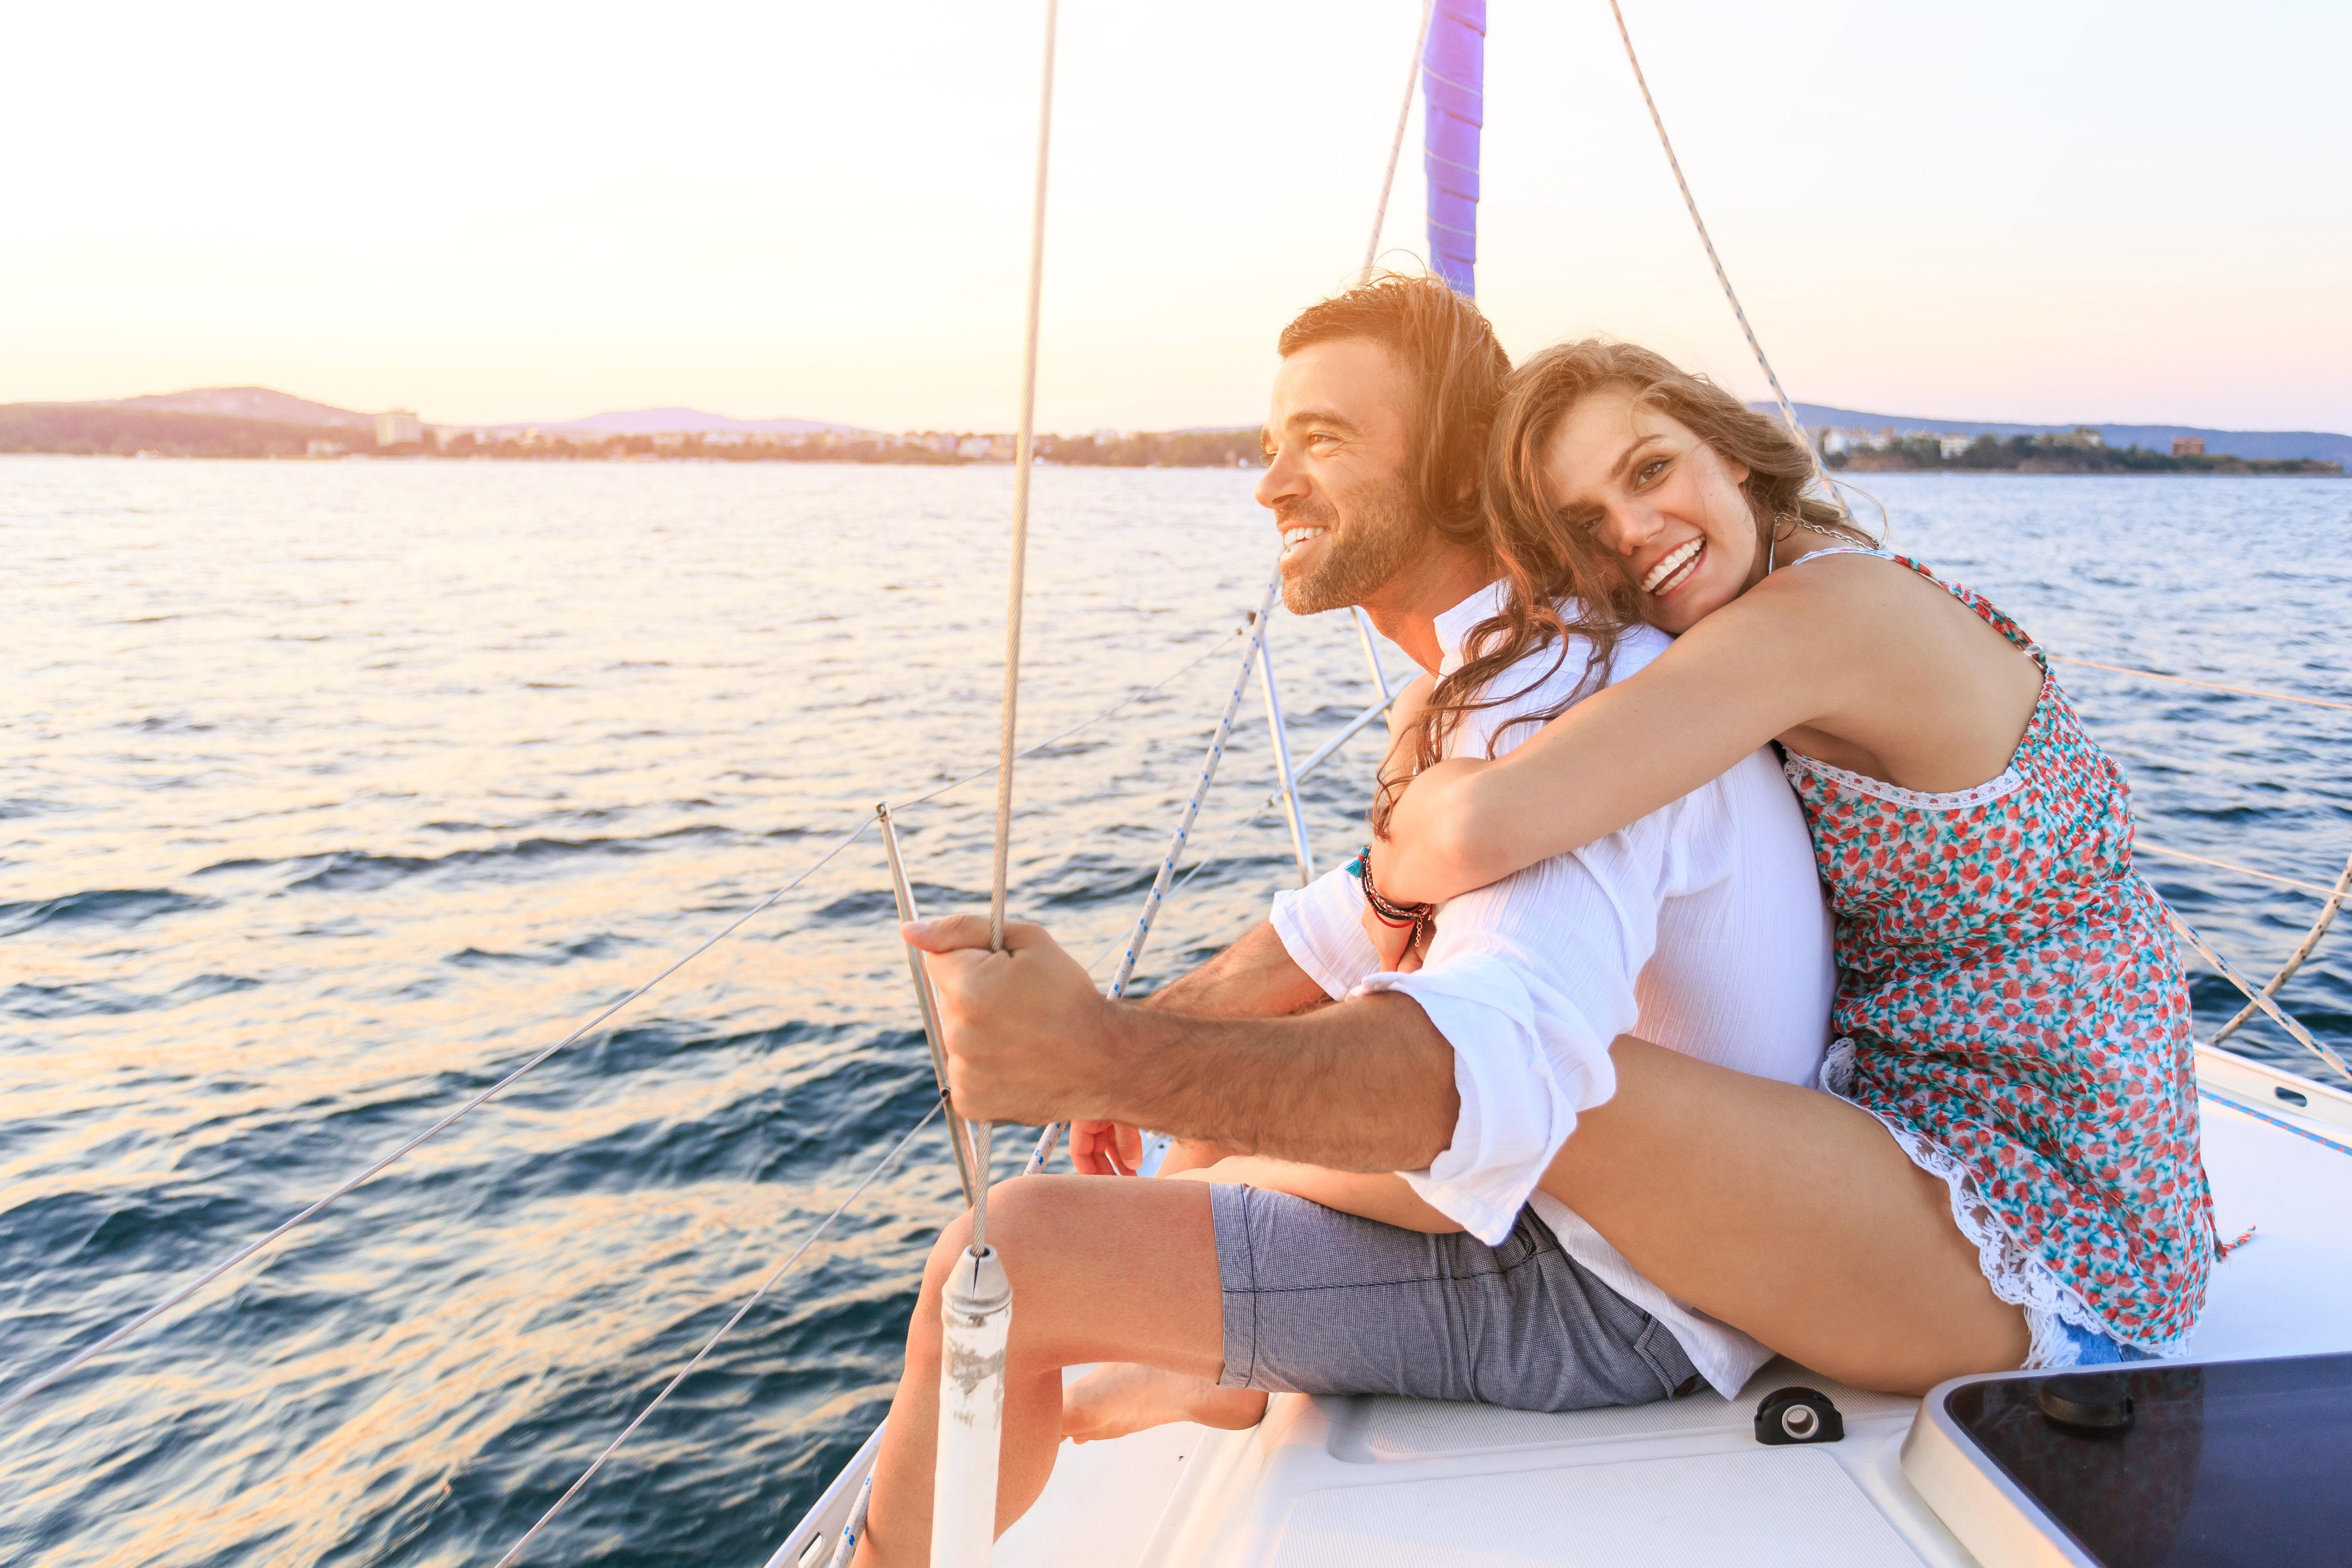 Honeymooners Smiling on Boat Ride